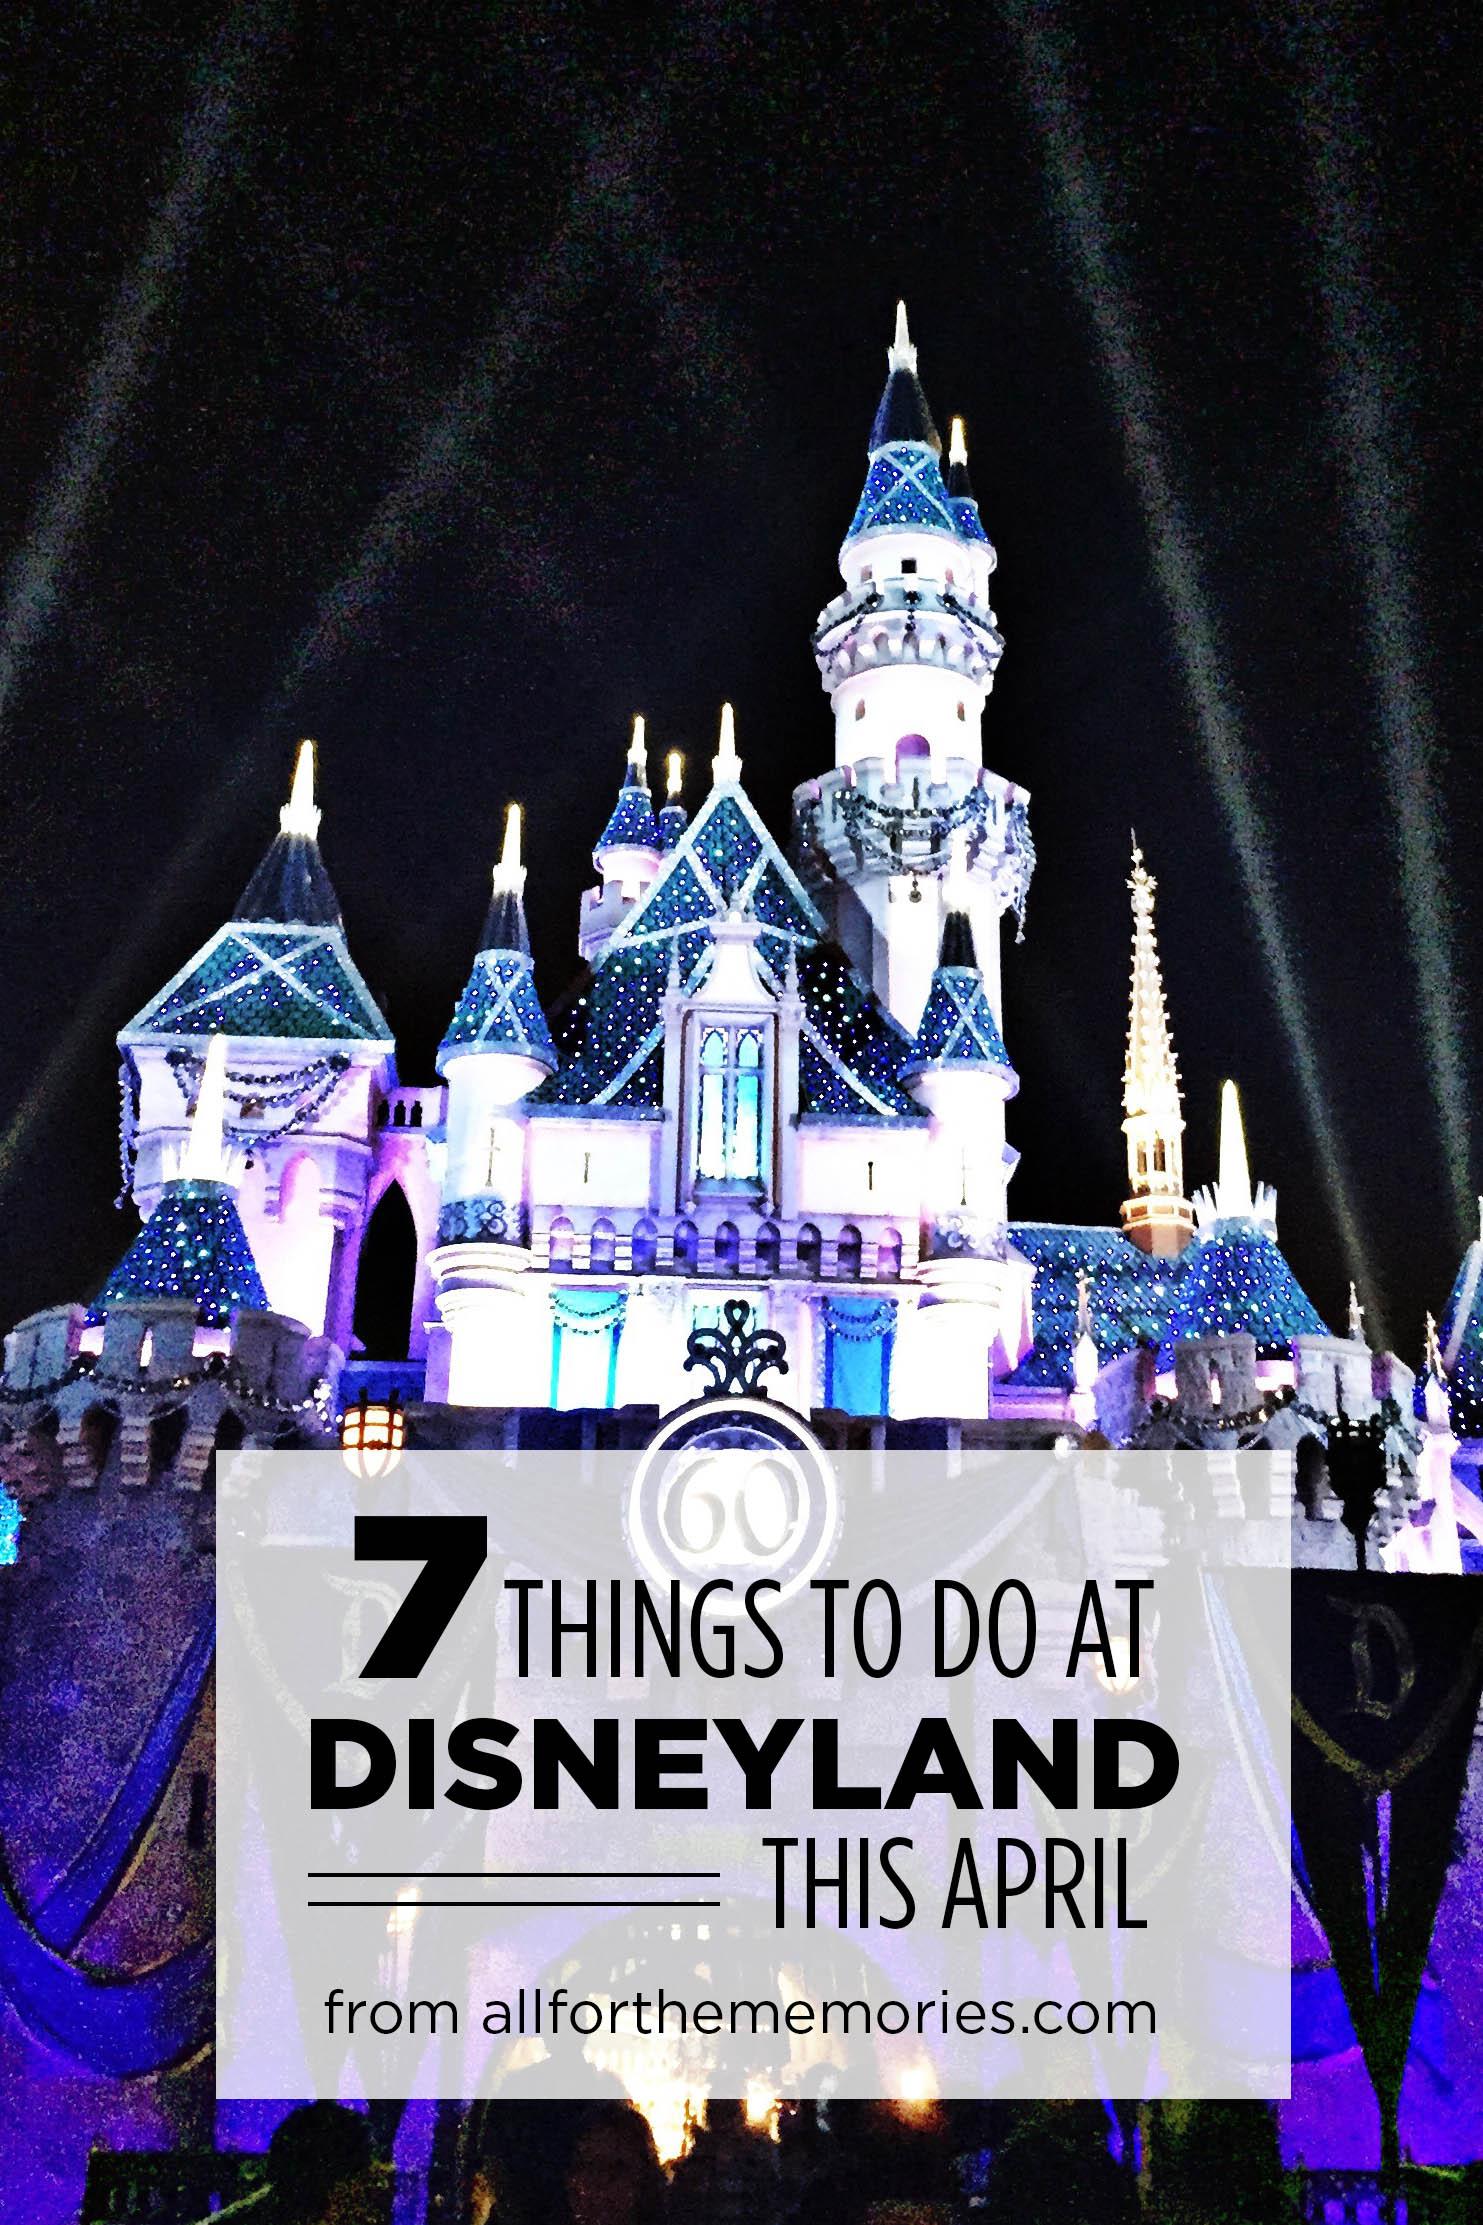 7 Things to do at Disneyland this April!